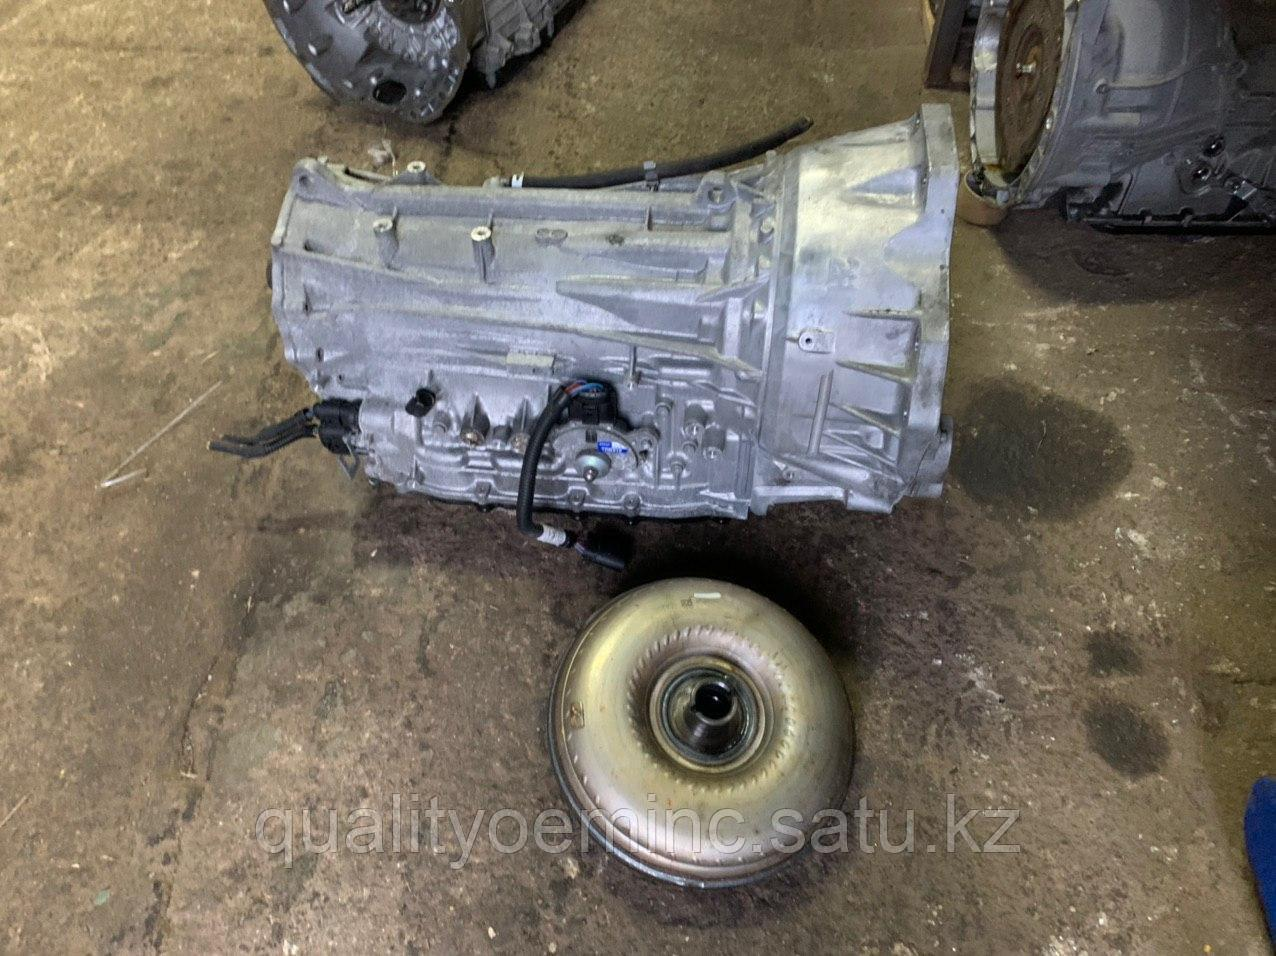 КПП автоматическая (АКПП) на Audi Q7 4L [рестайлинг]